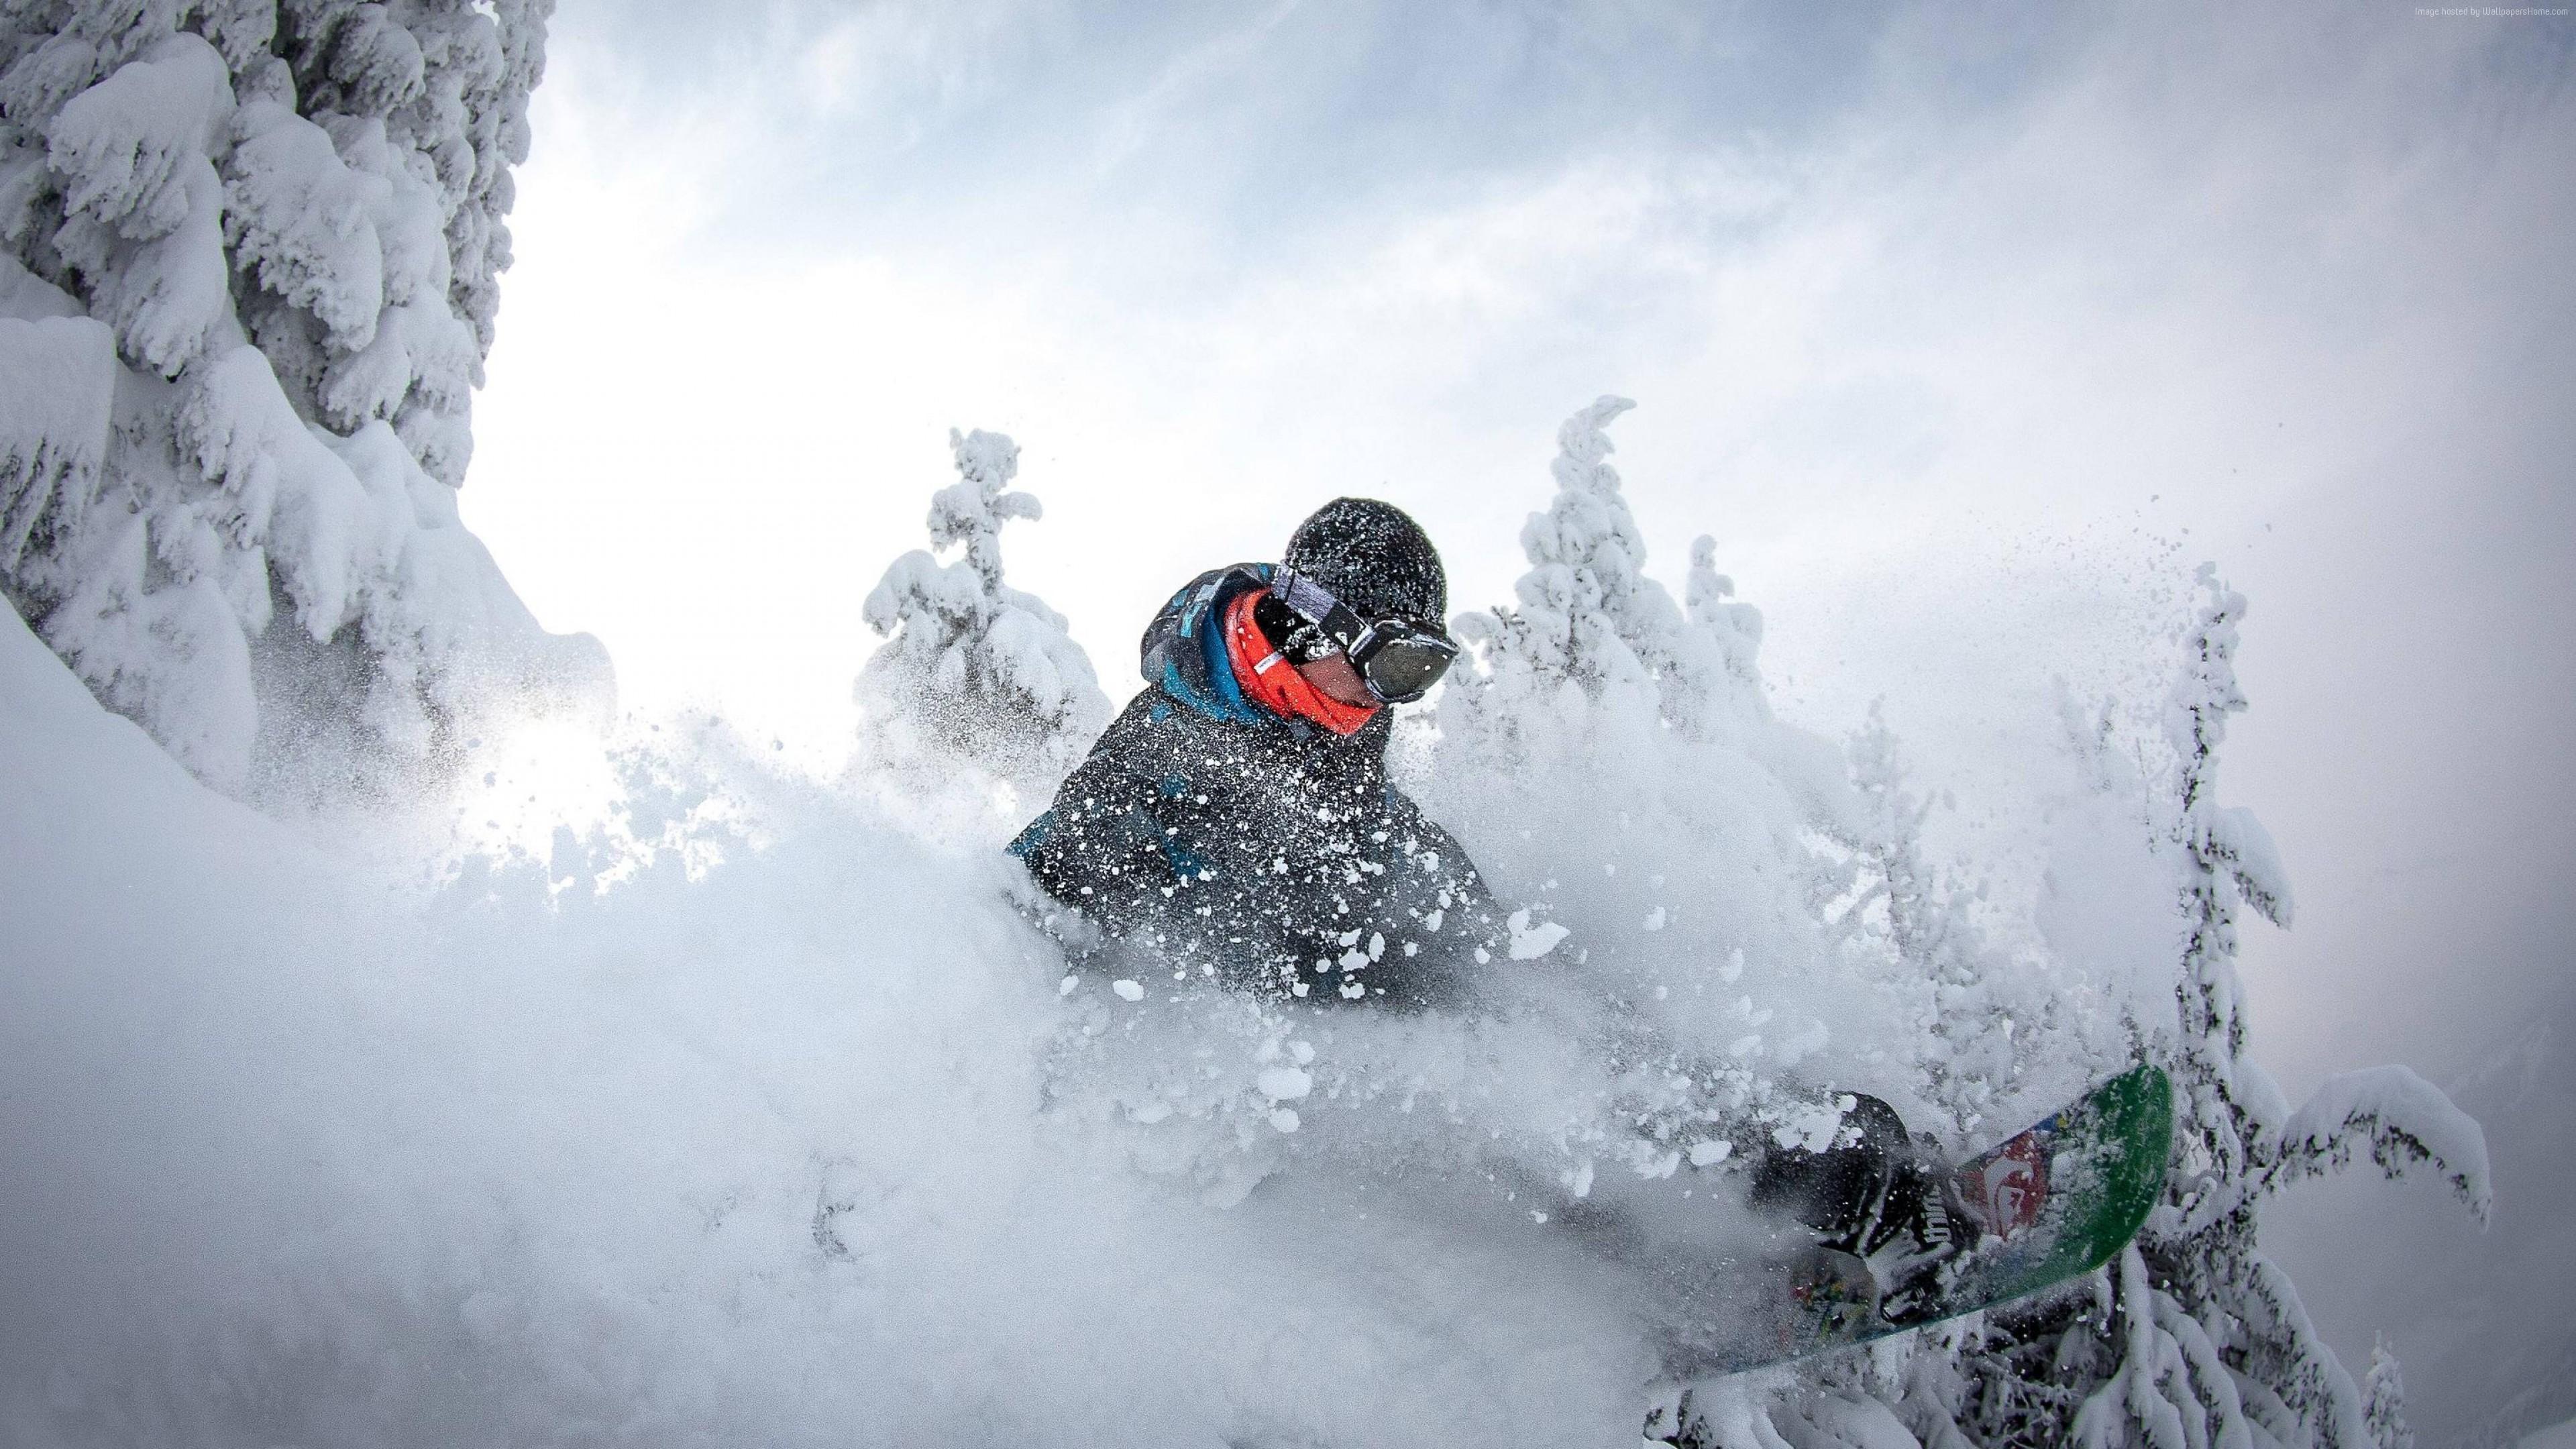 wallpaper snow, snowboard, winter, sport snow, snowboard, winter